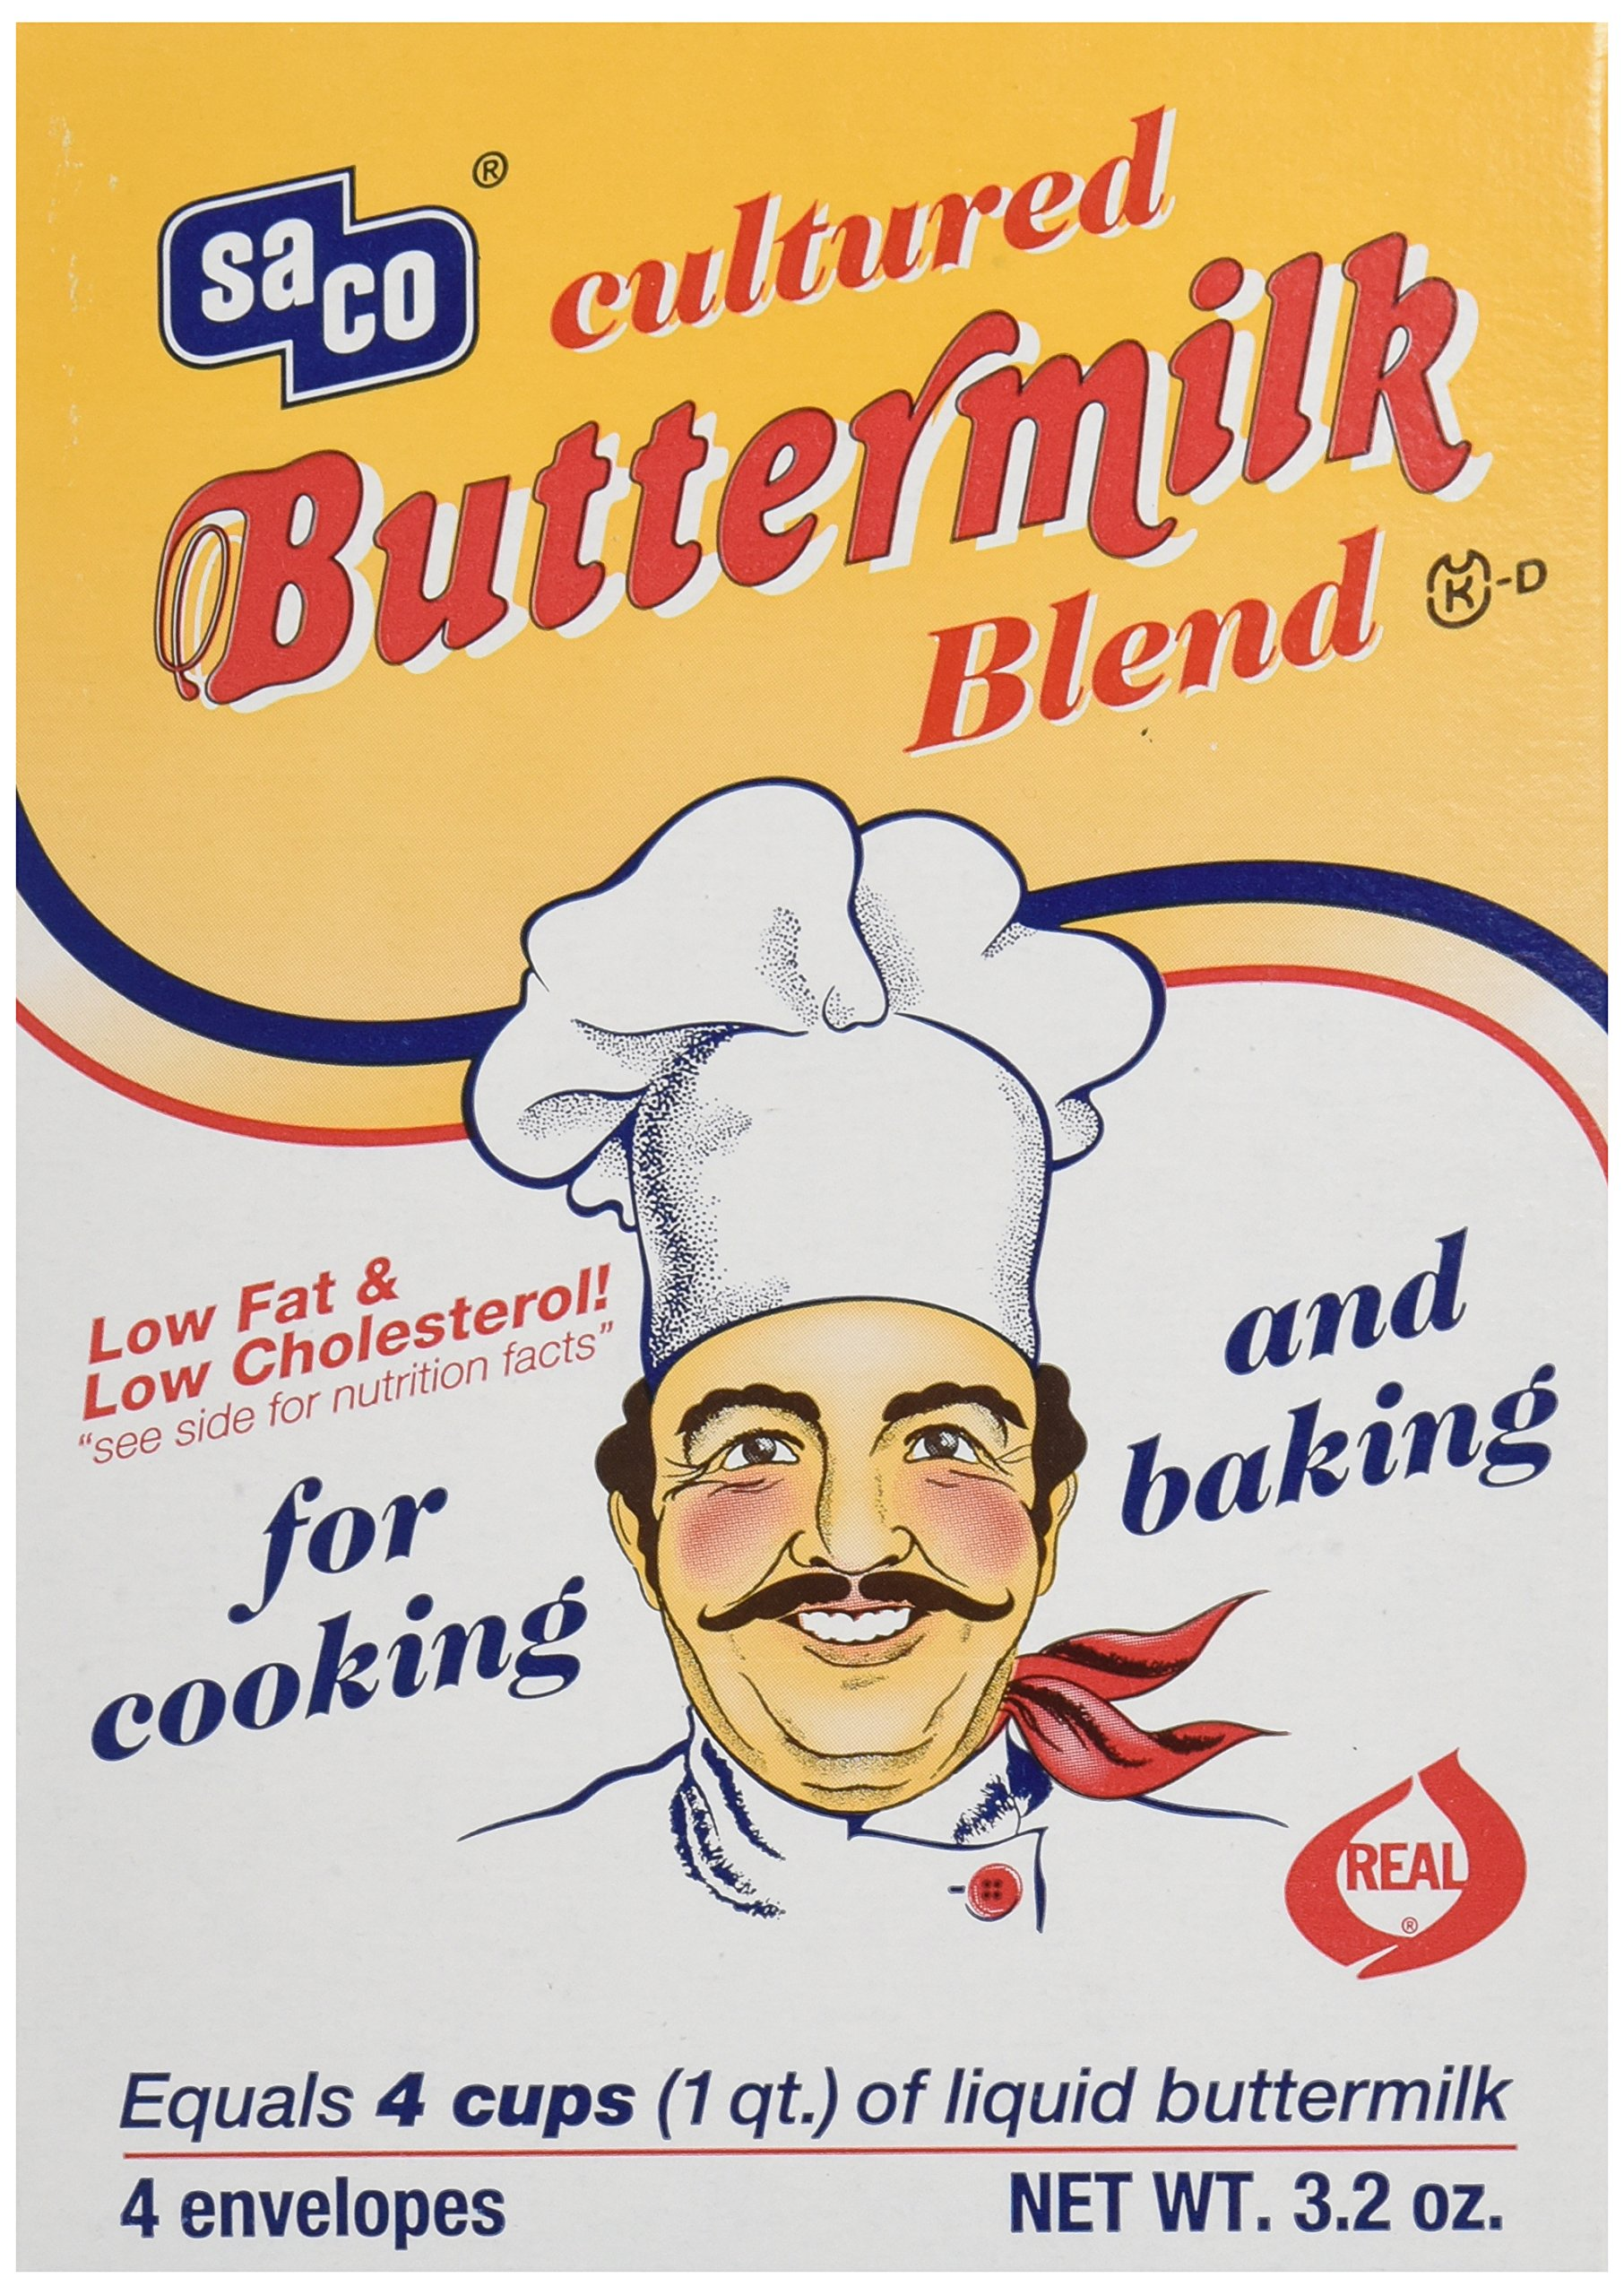 Saco Foods Cultured Buttermilk Blend, 3.2 oz